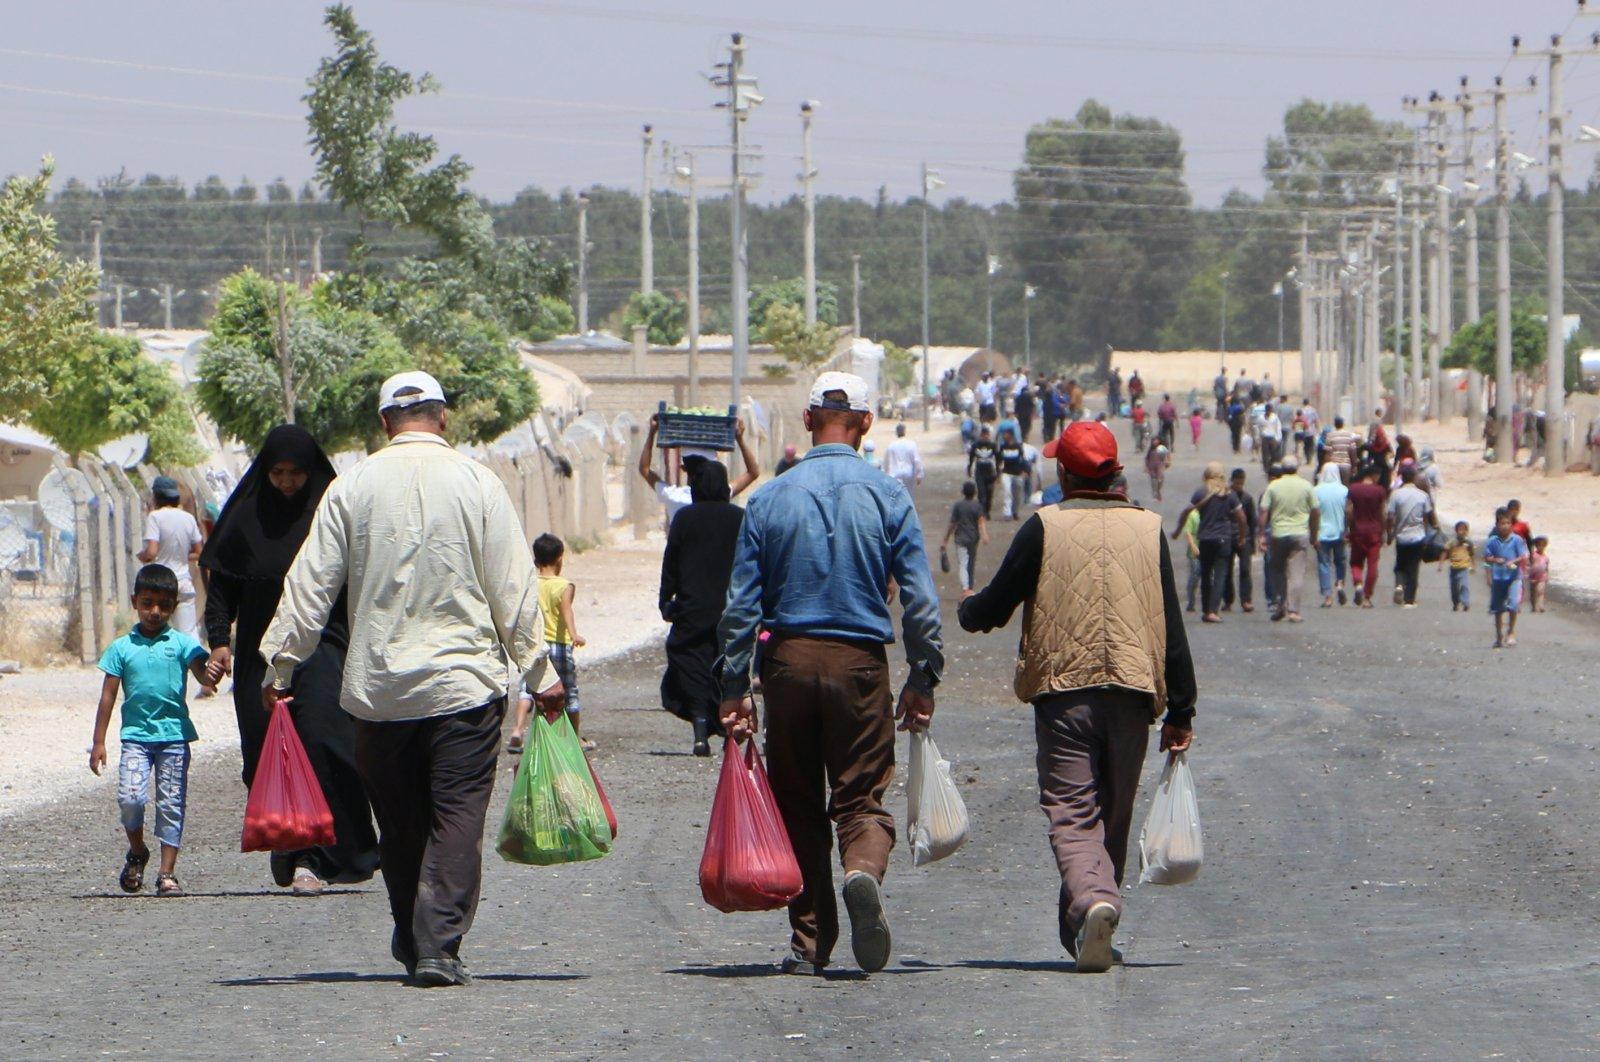 Syrians return to their homes in northern Syria through the Akçakale border gate in Şanlıurfa, Turkey. (AA Photo)